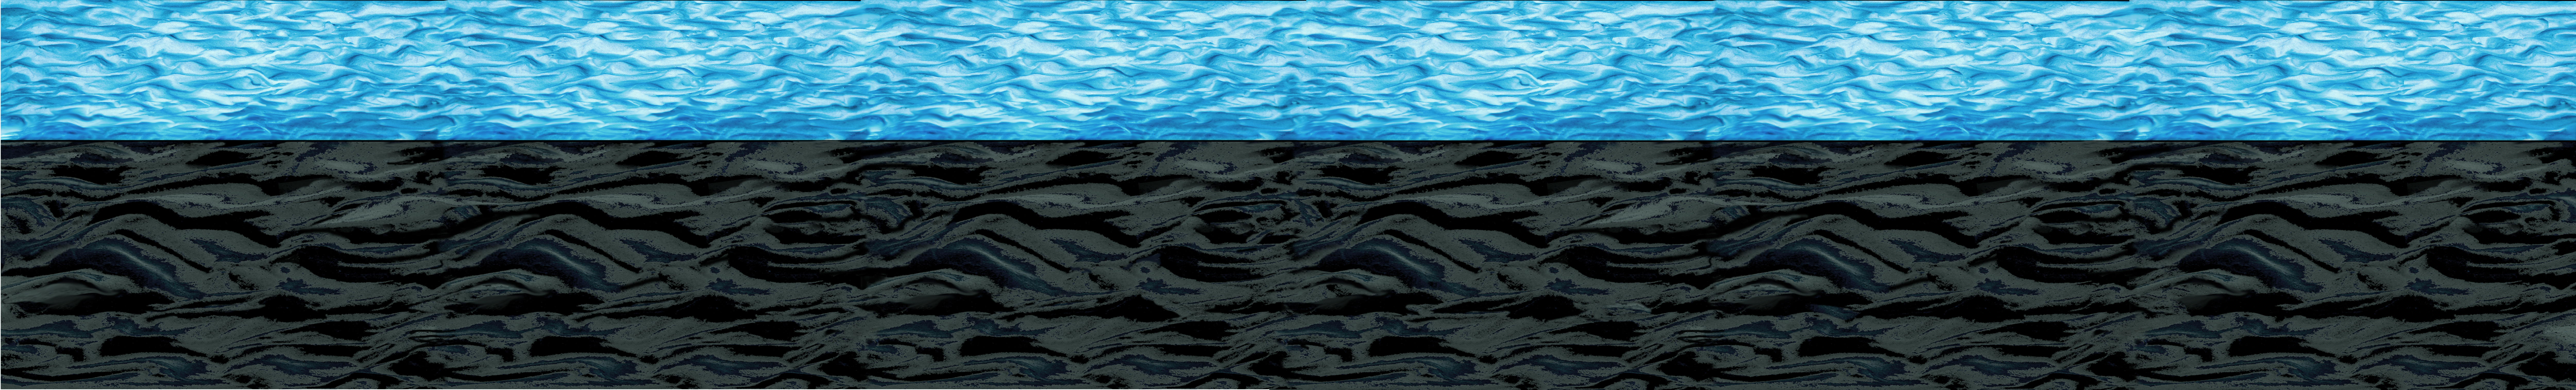 E.V. OIL, COAL & WATER